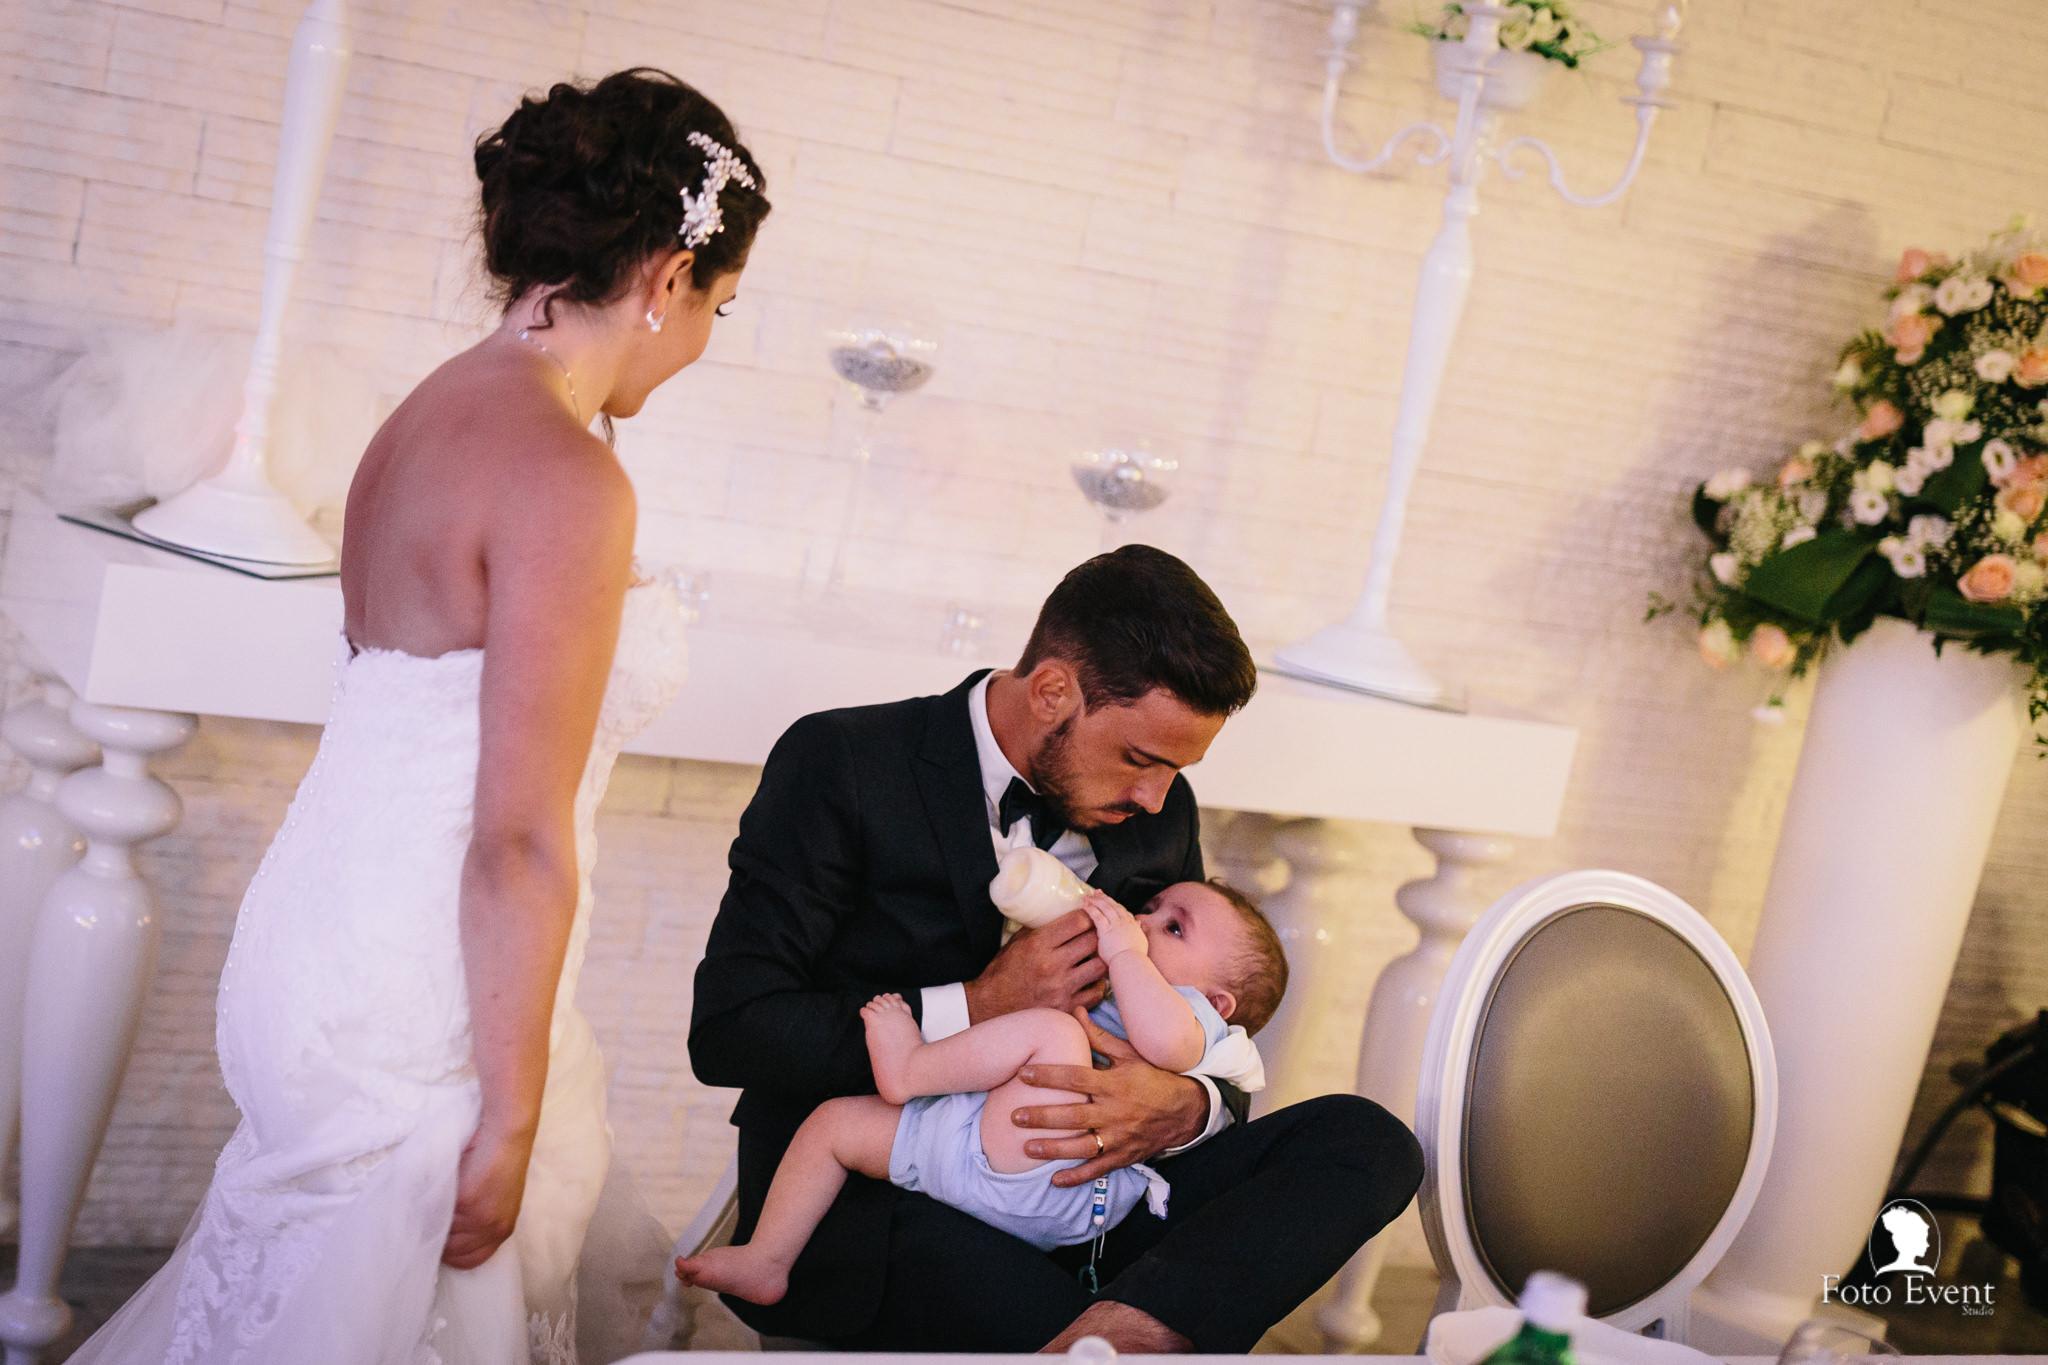 052-2019-08-31-Matrimonio-Serena-e-Saverio-Tarantino-zoom-634